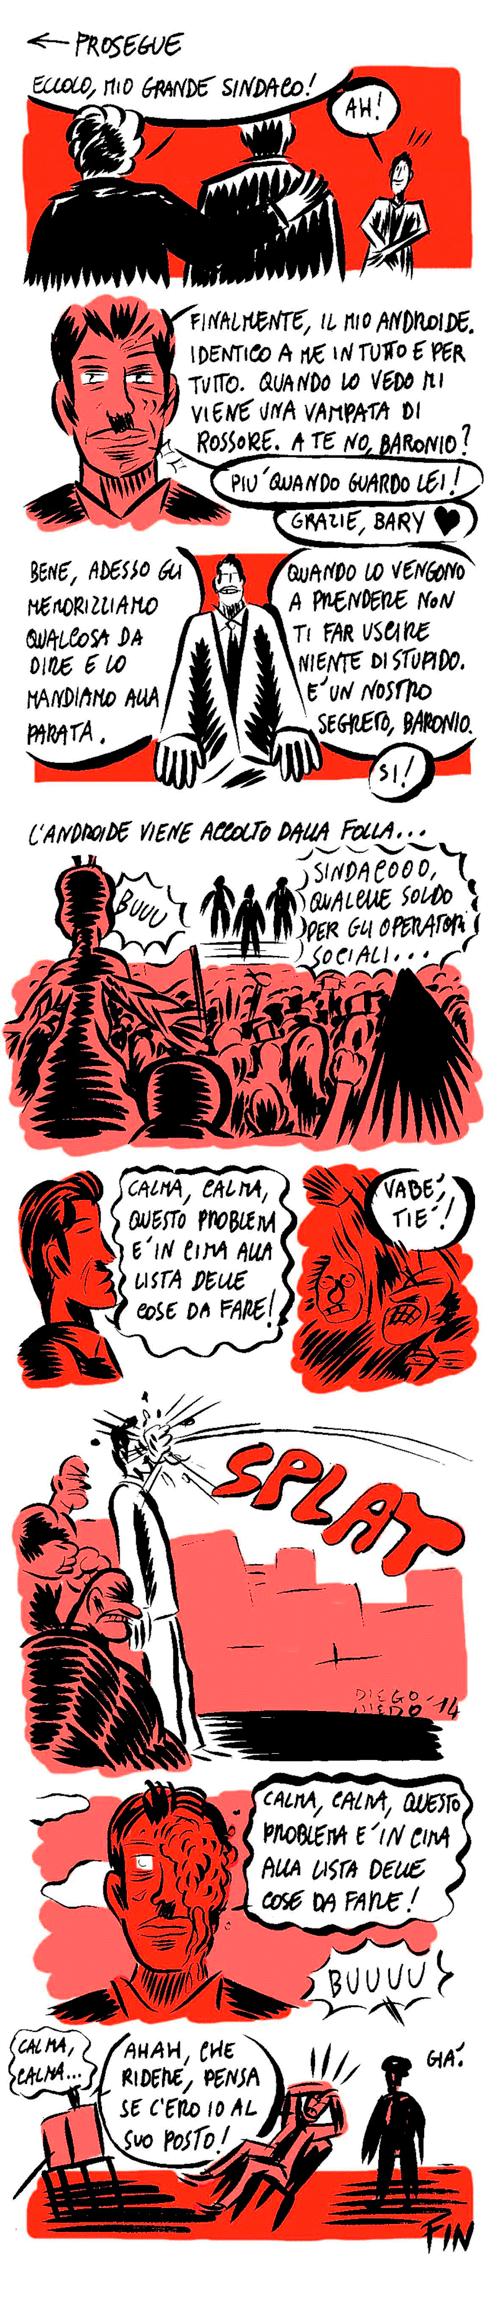 sindaco16-2